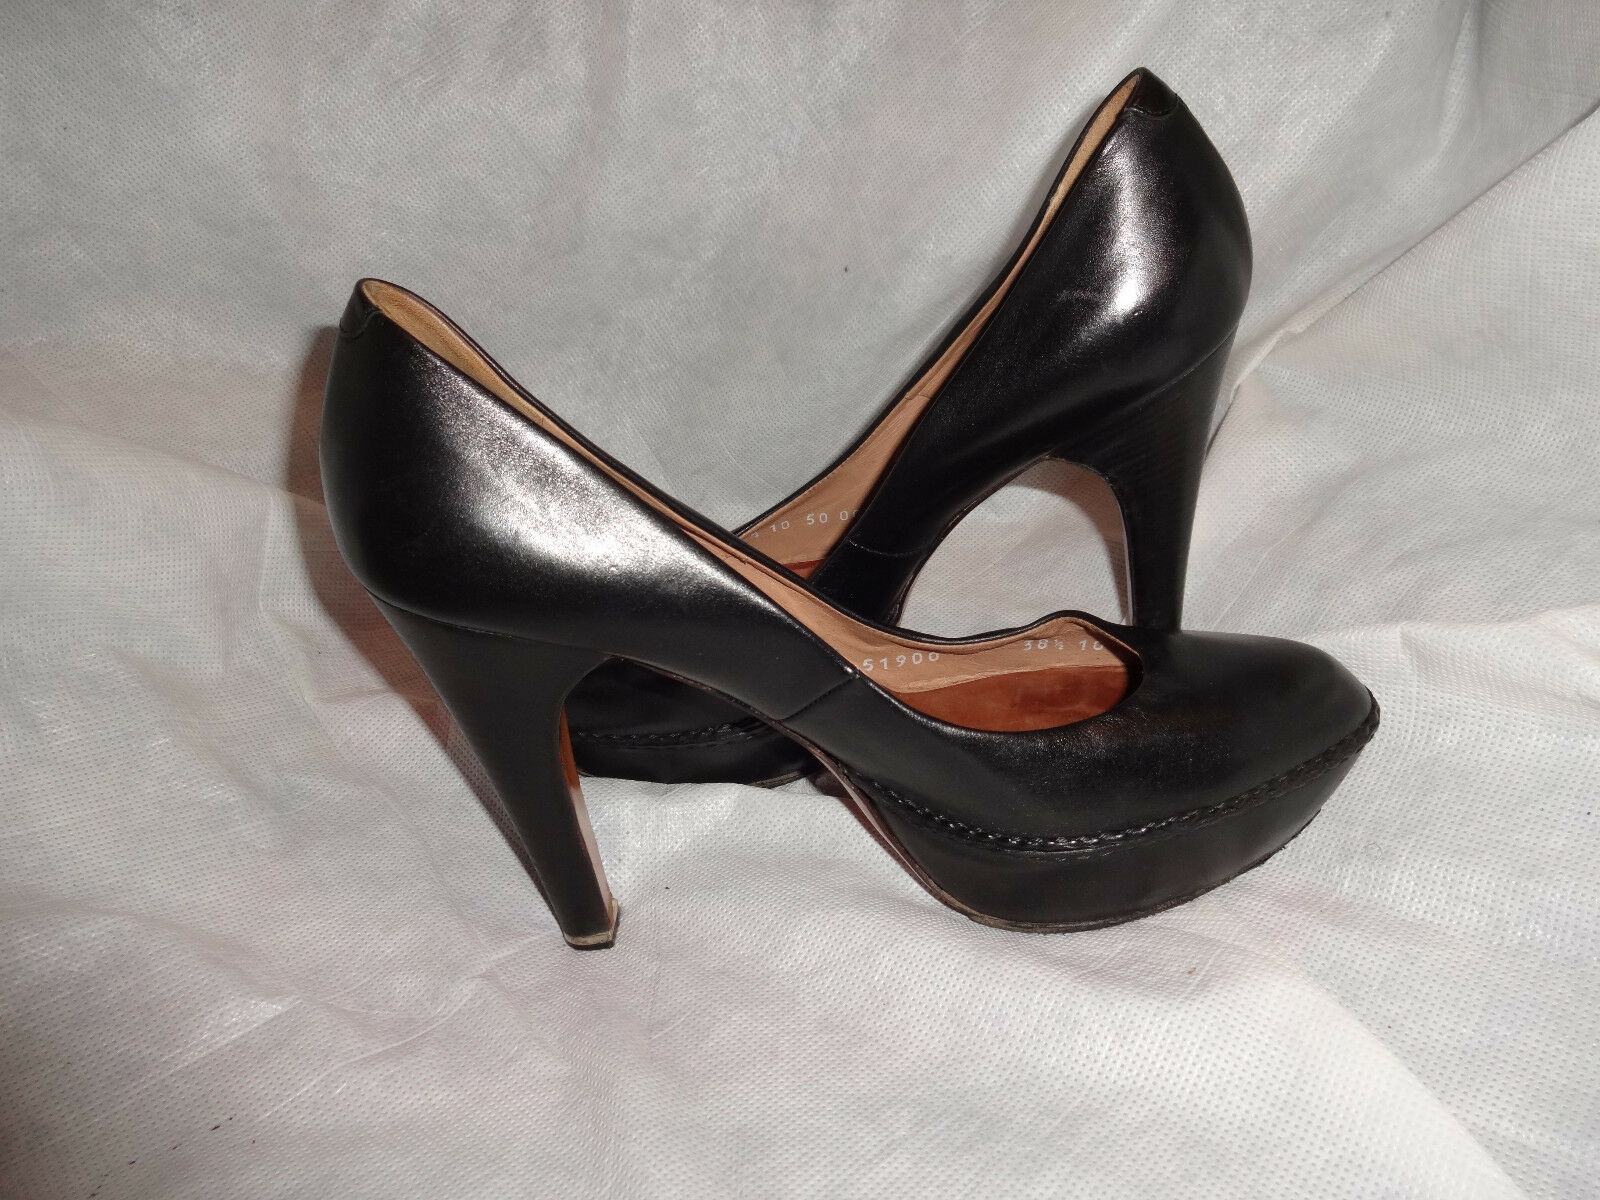 MORESCHI WOMEN BLACK LEATHER SIZE SLIP ON HEEL Schuhe SIZE LEATHER UK 5.5 EU 38.5 VGC 65438e